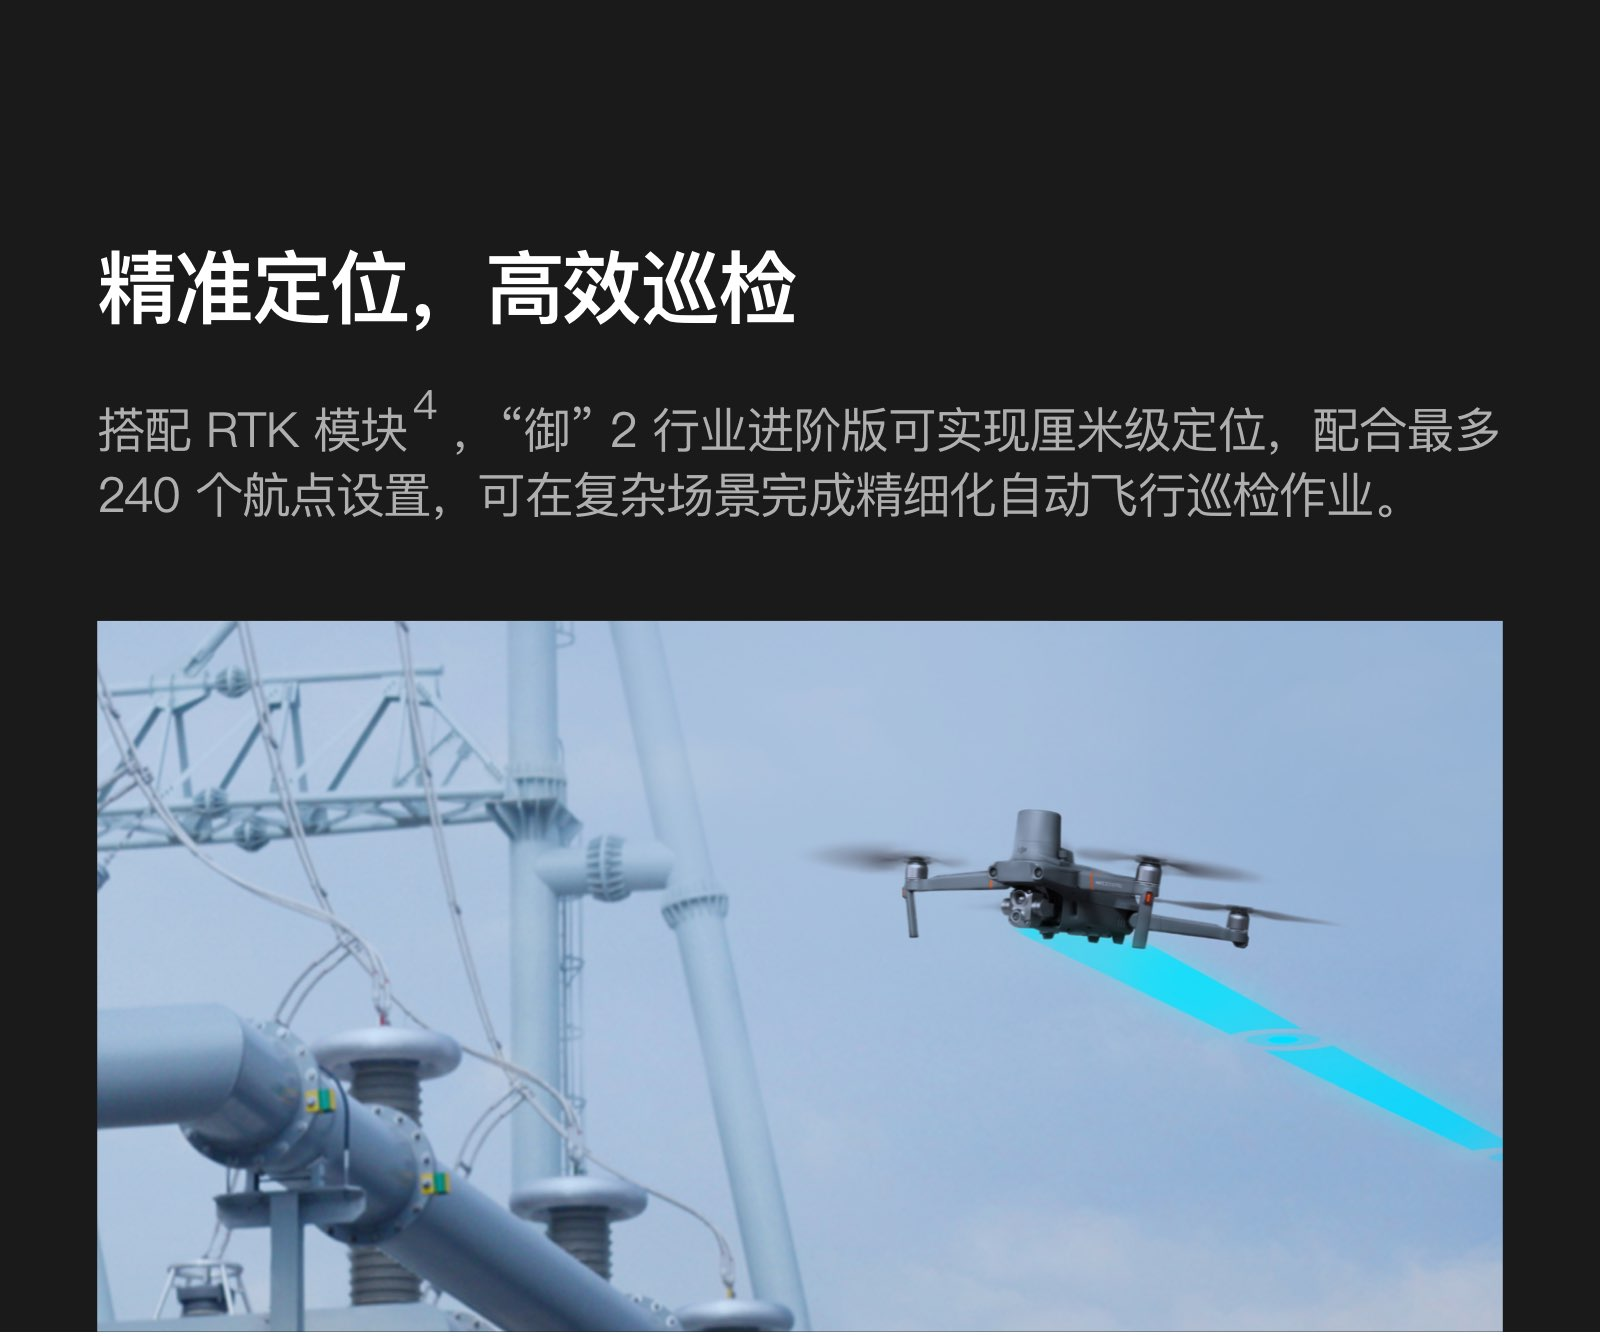 M2EA_PC%20_cn_8.jpg